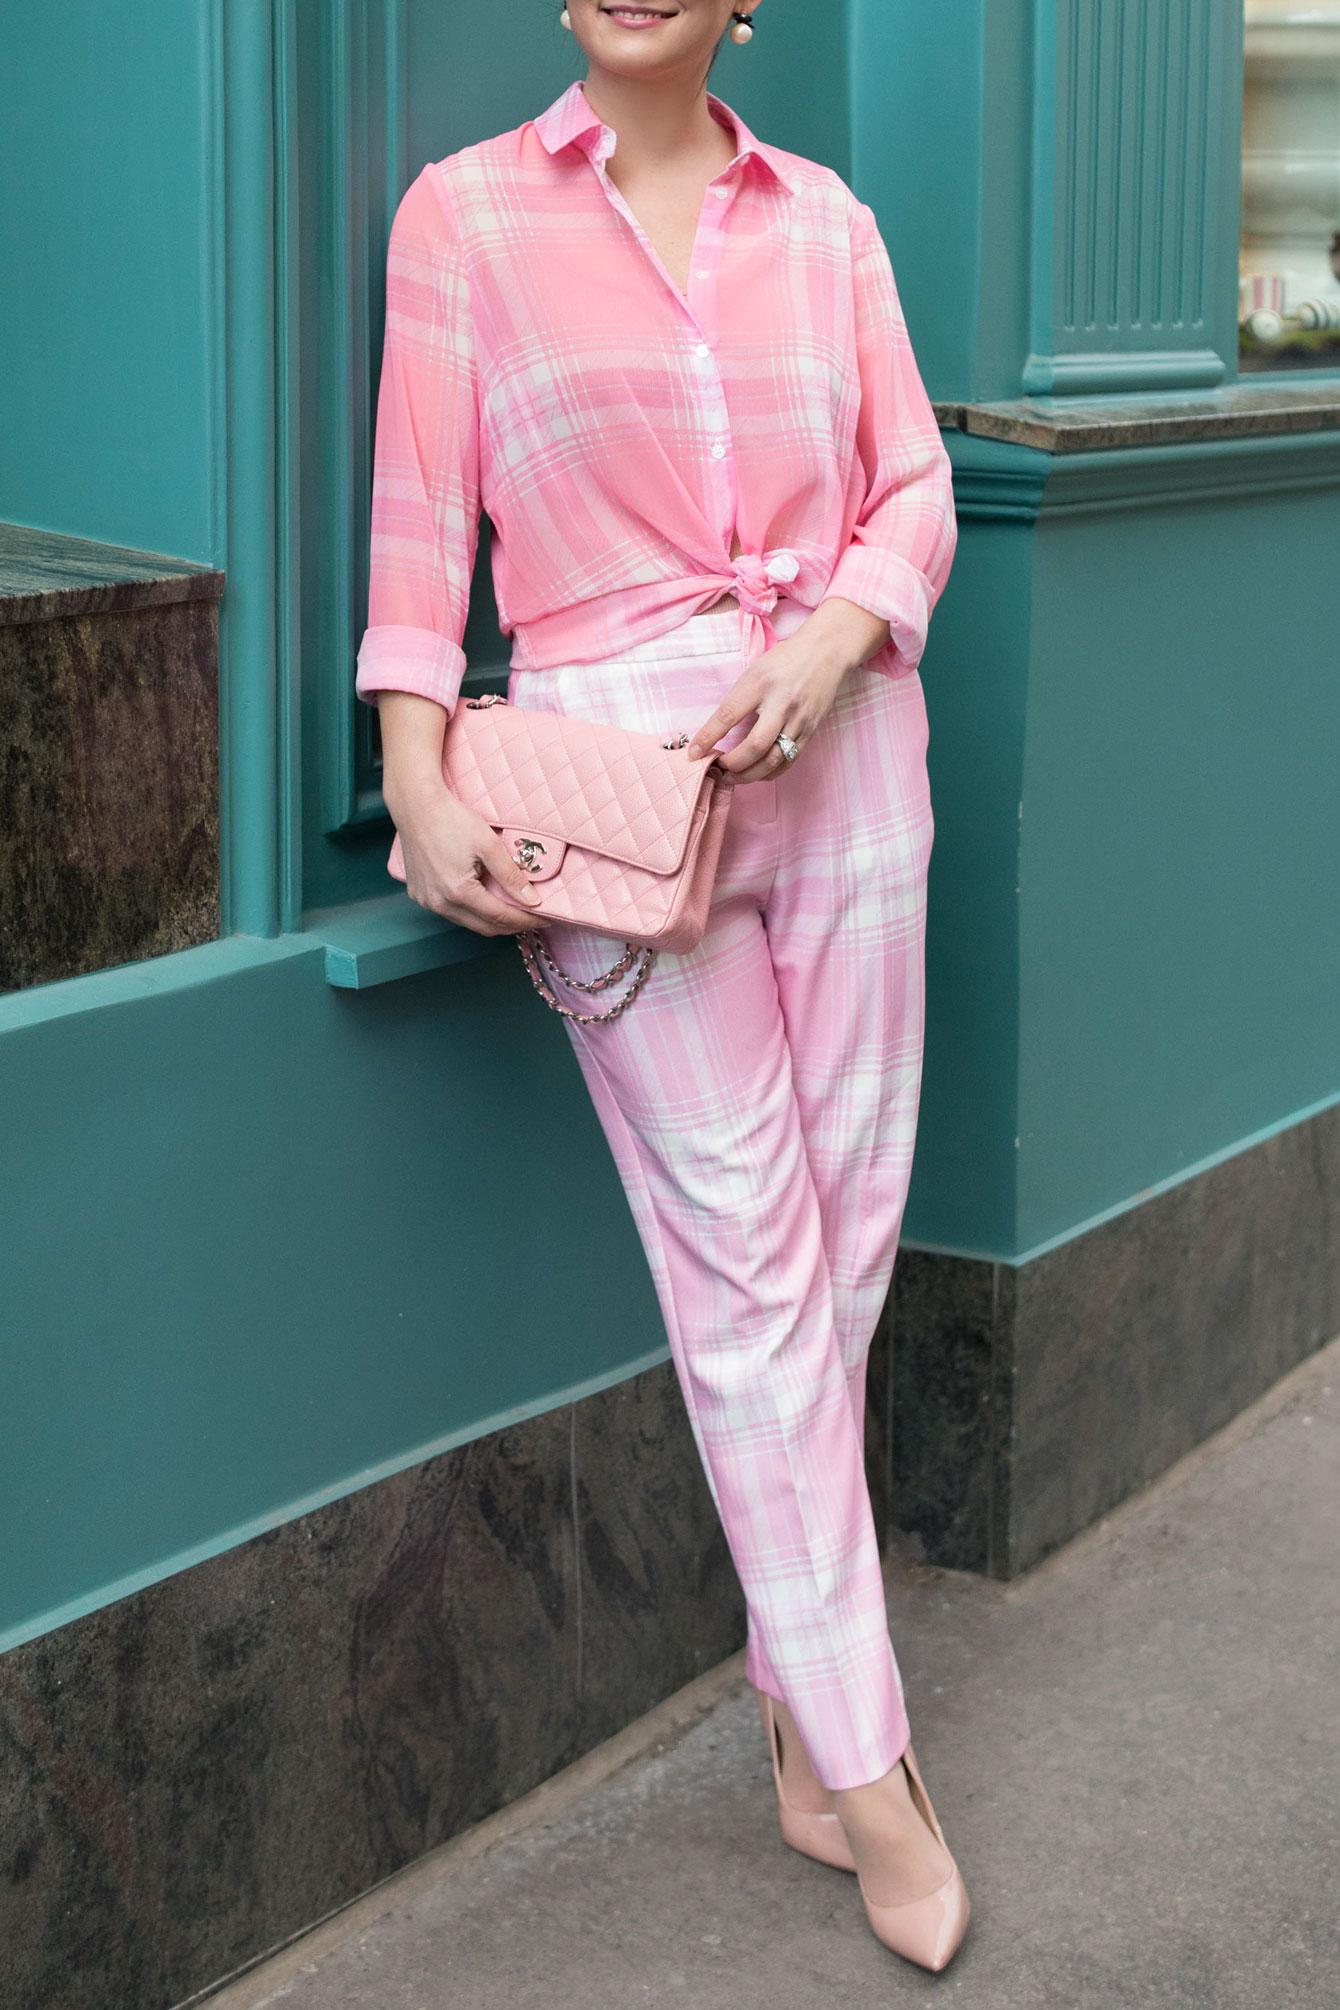 ASOS Pink Plaid Check Pants